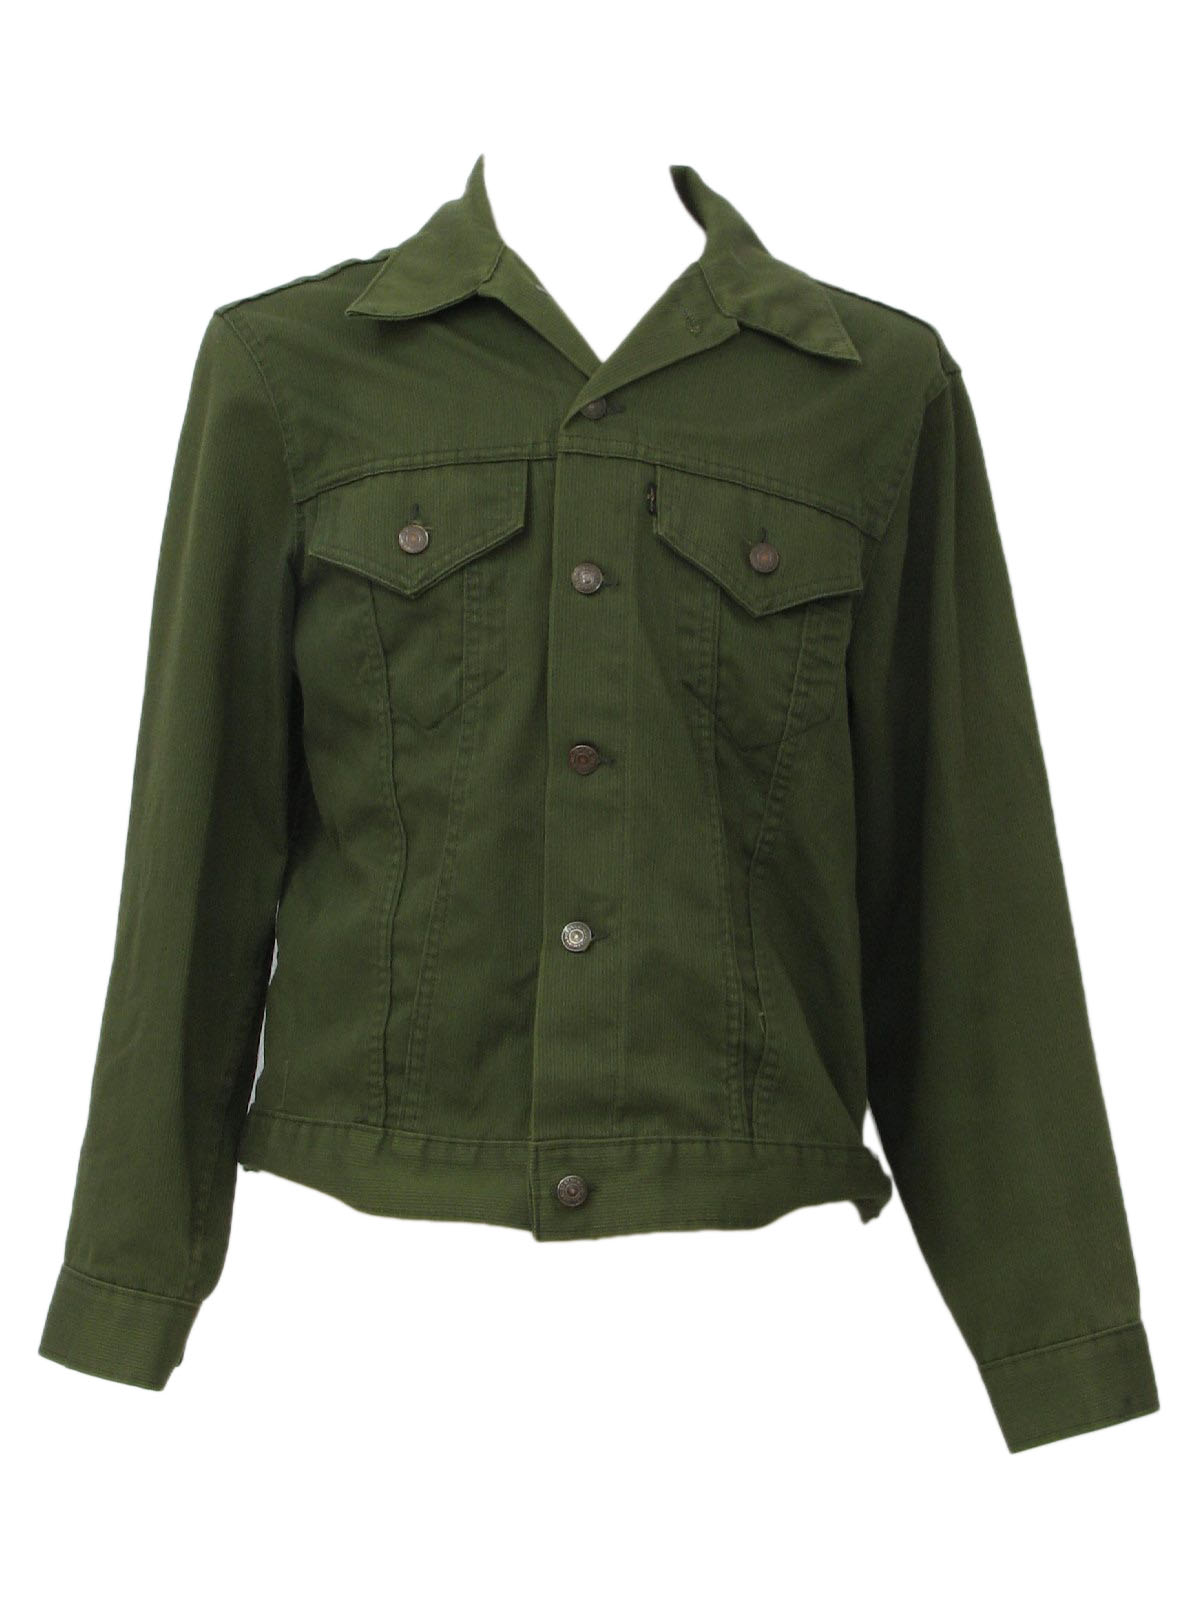 1970s Levis Mens Denim Style Corduroy Jacket